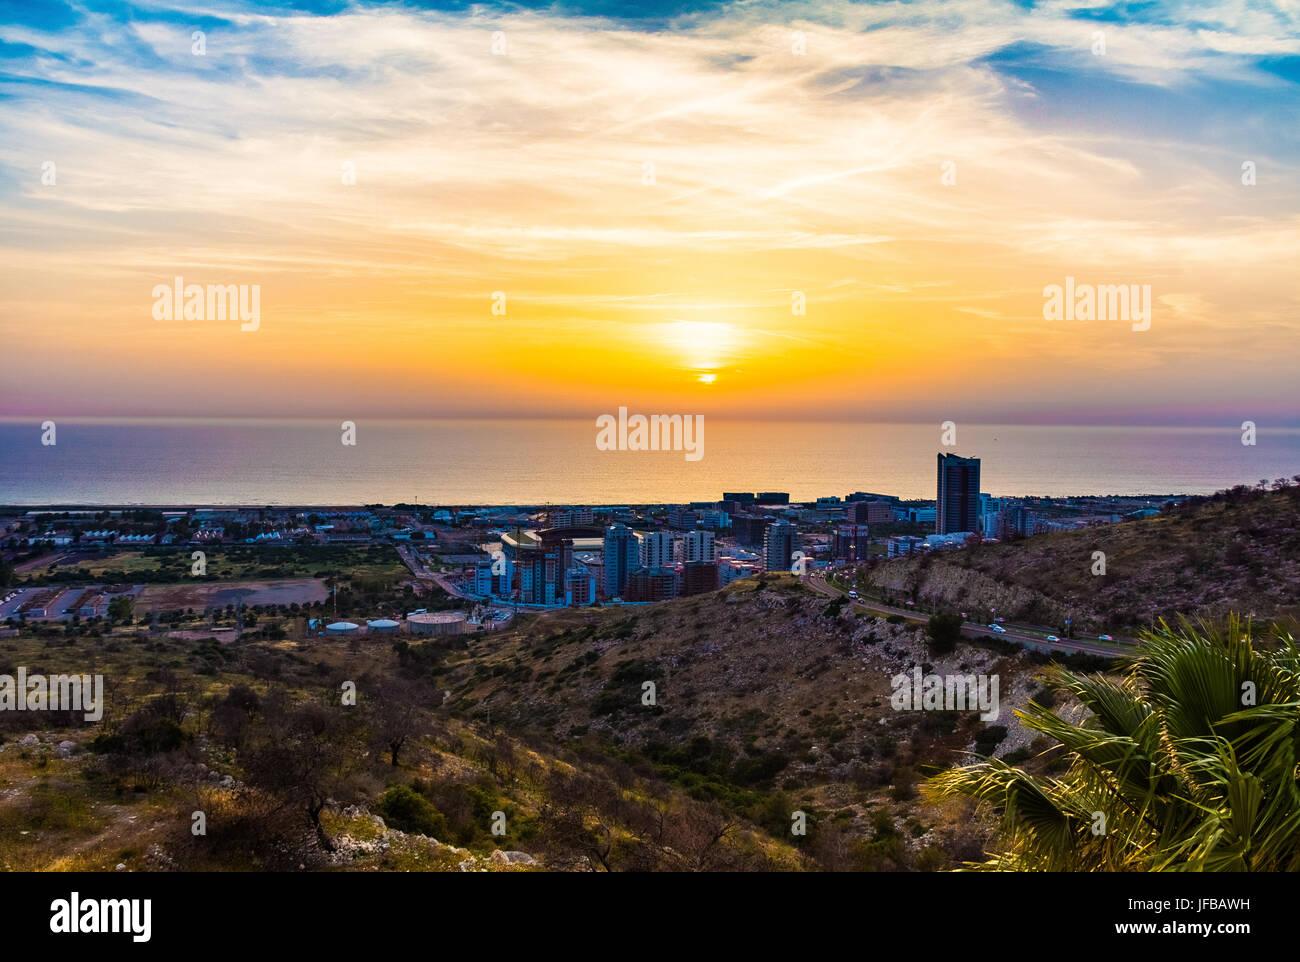 Sunset in Haifa, Israel - Stock Image